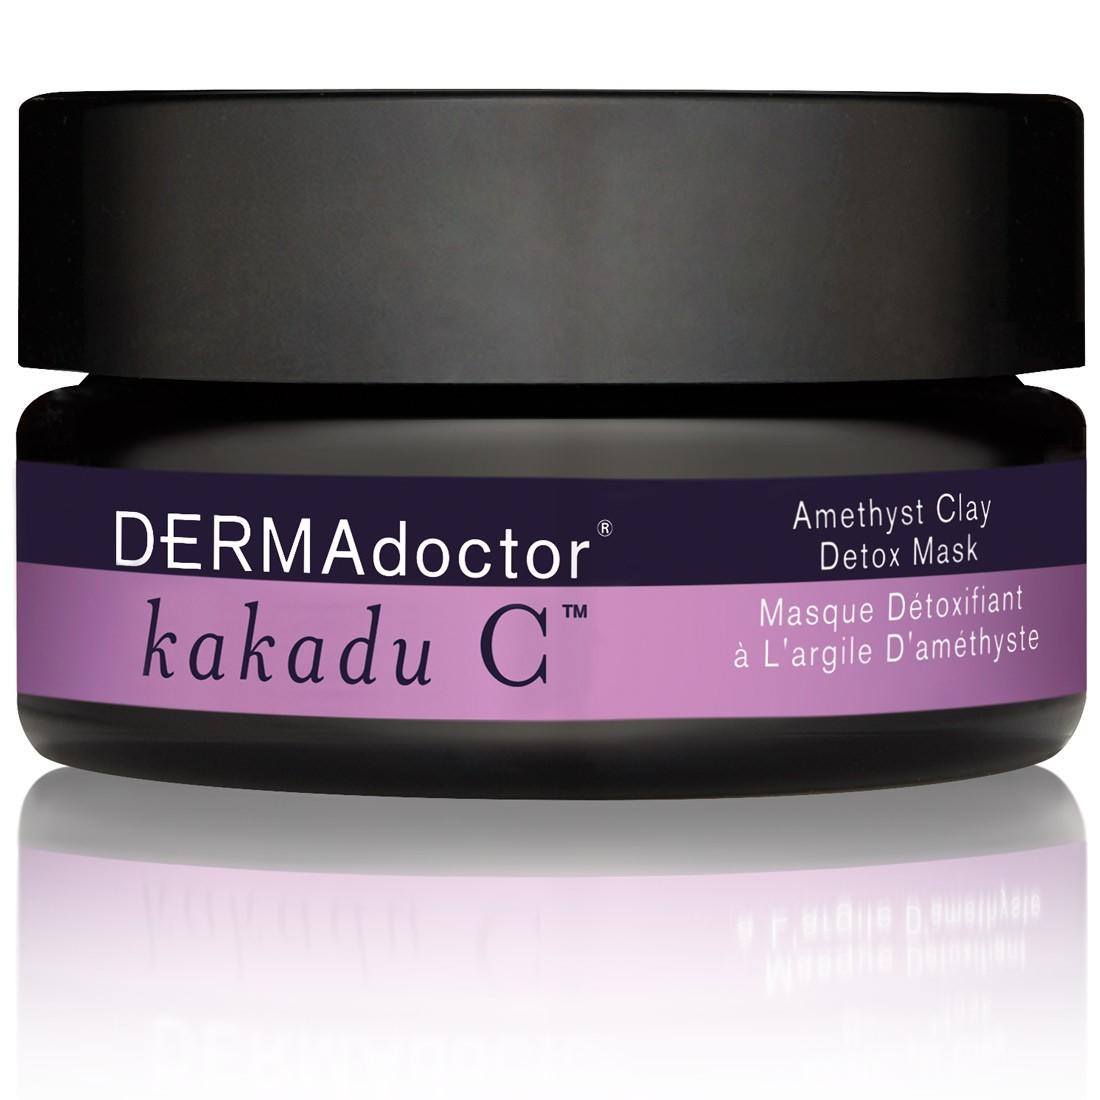 Kakadu Amethyst Clay Detox Mask by dermadoctor #6